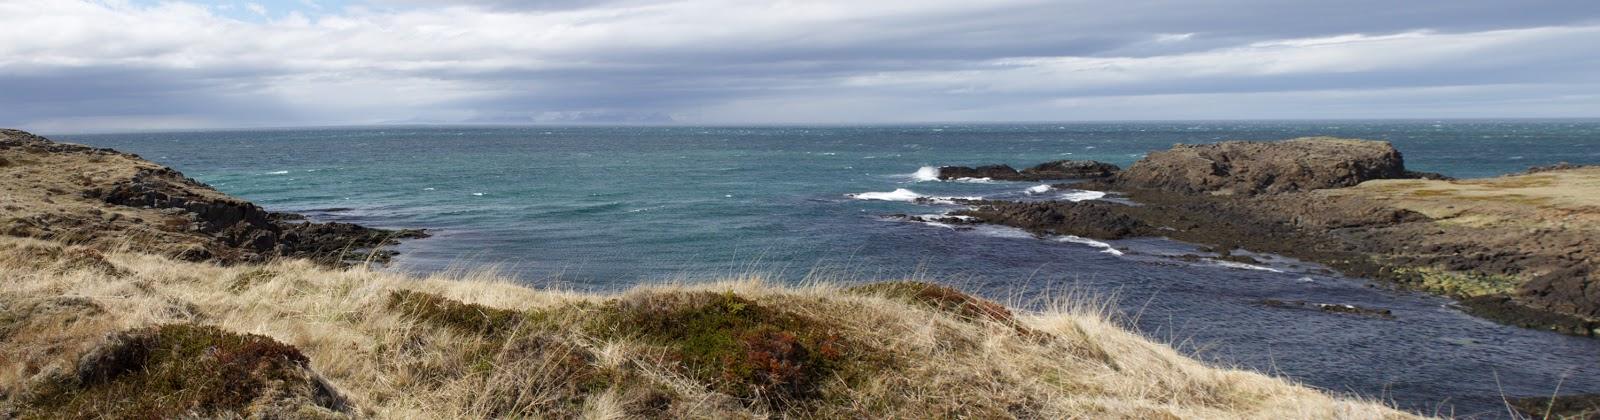 cliffs9